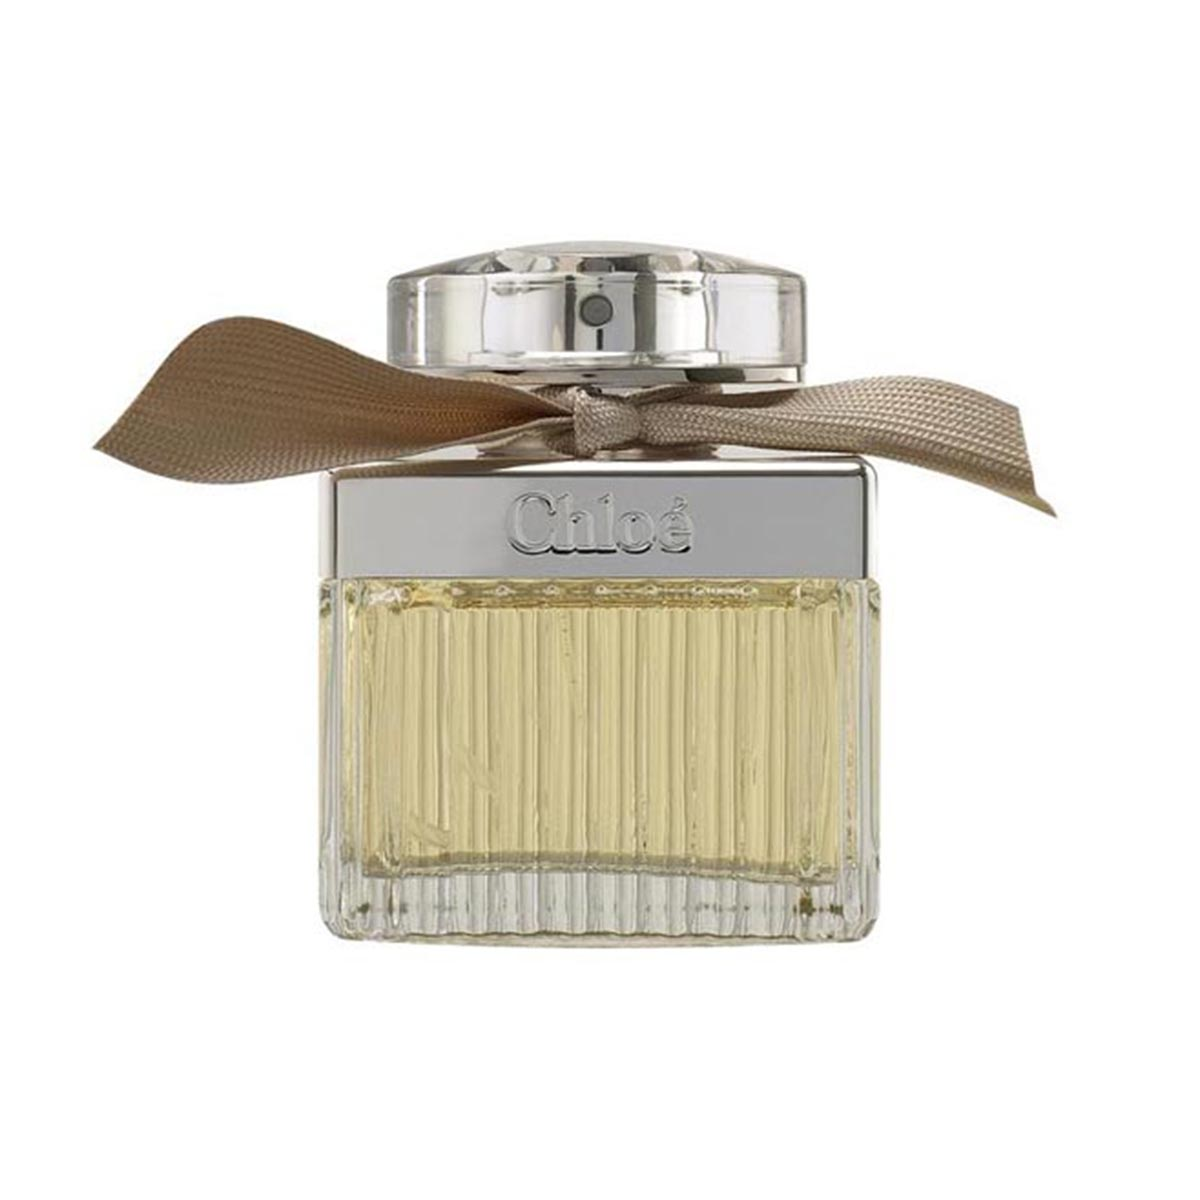 Chloe eau de parfum 75ml vaporizador